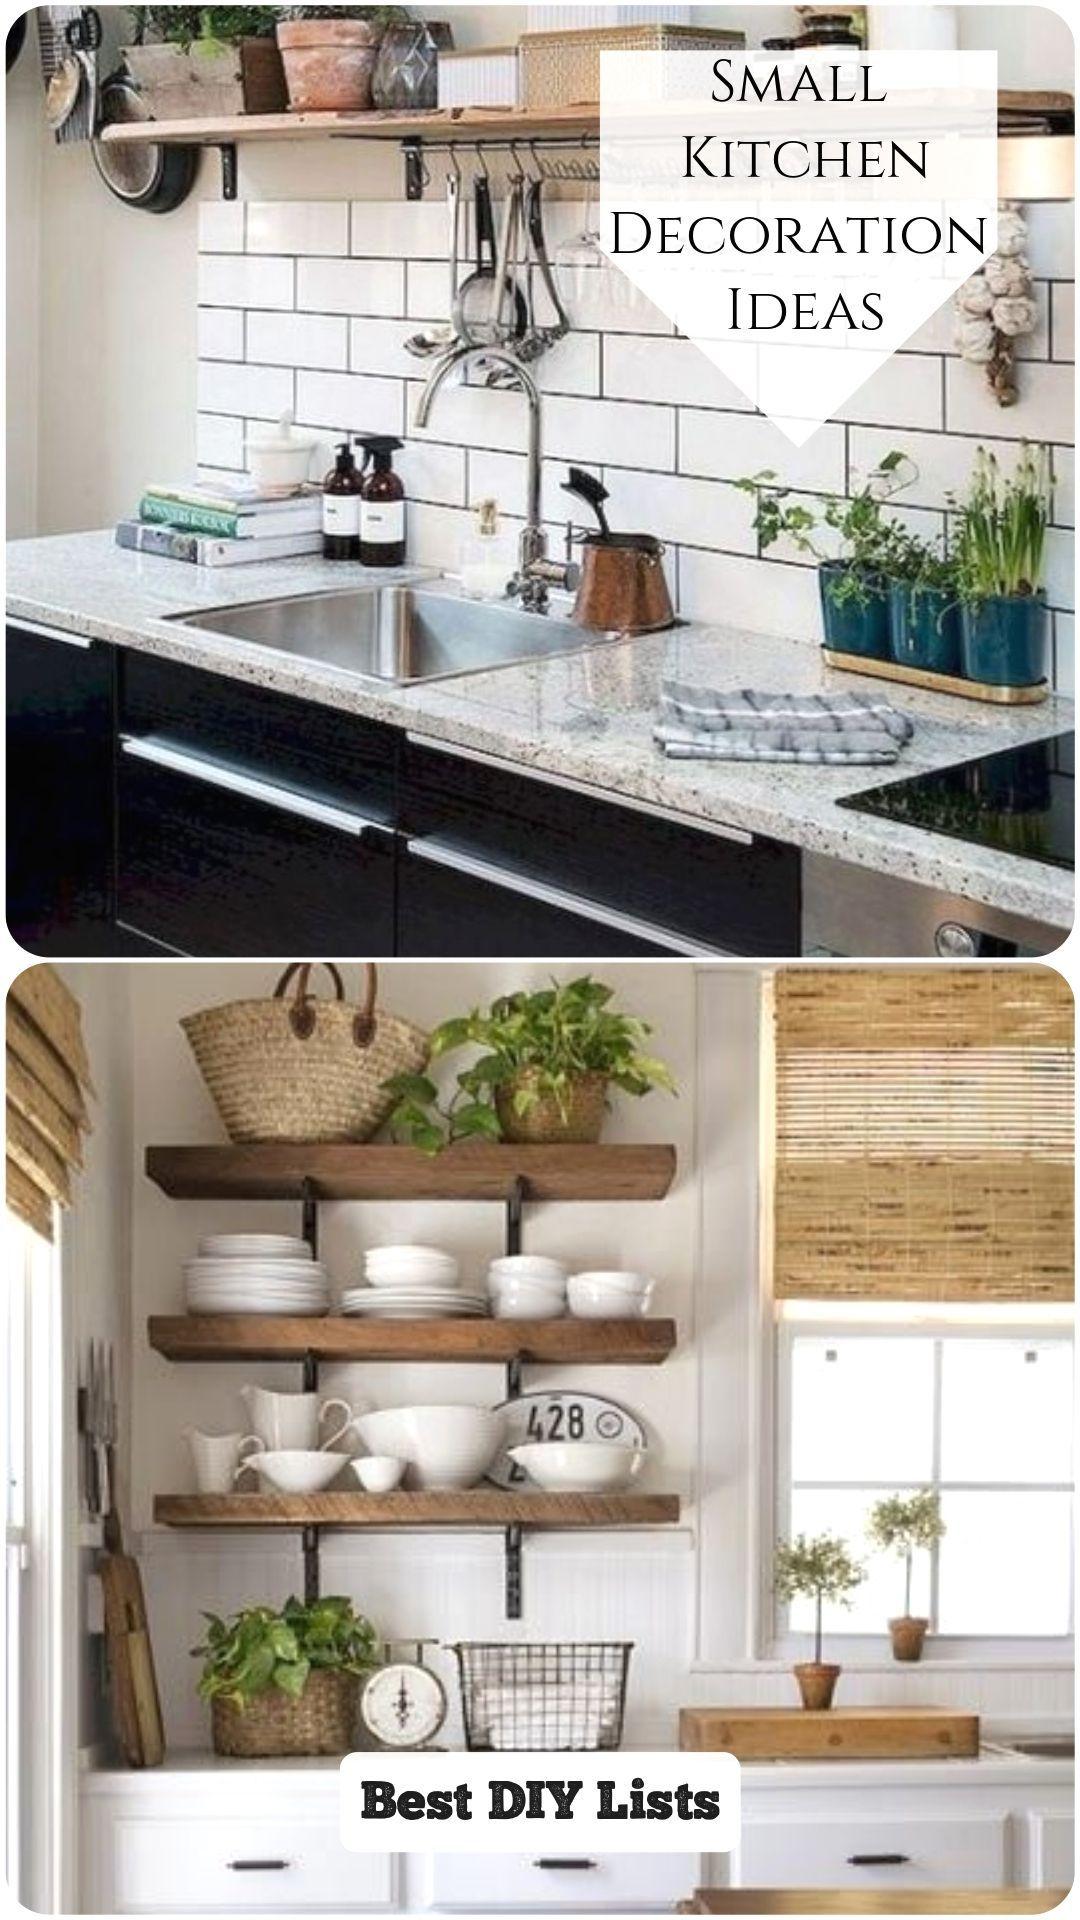 Home Decor Apartment 10 Clever Ideas For Small Kitchen Decoration Smallkitchendecor Home Decor Ap In 2020 Home Decor Kitchen Kitchen Remodel Small Small Kitchen Decor